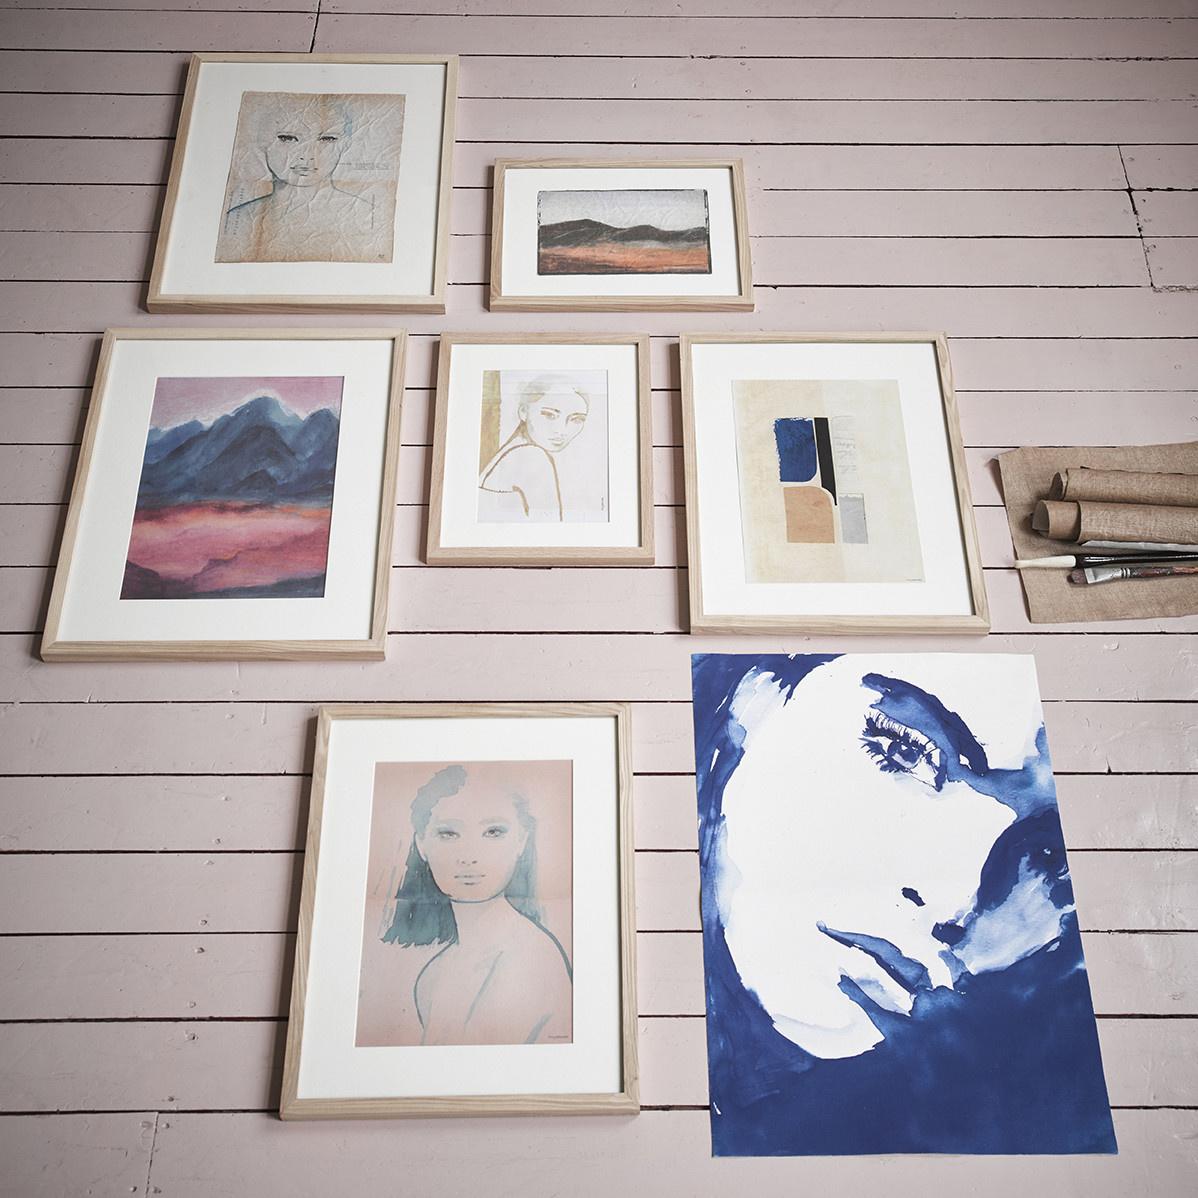 Wandschilderij tiny art frame m: aimee-2